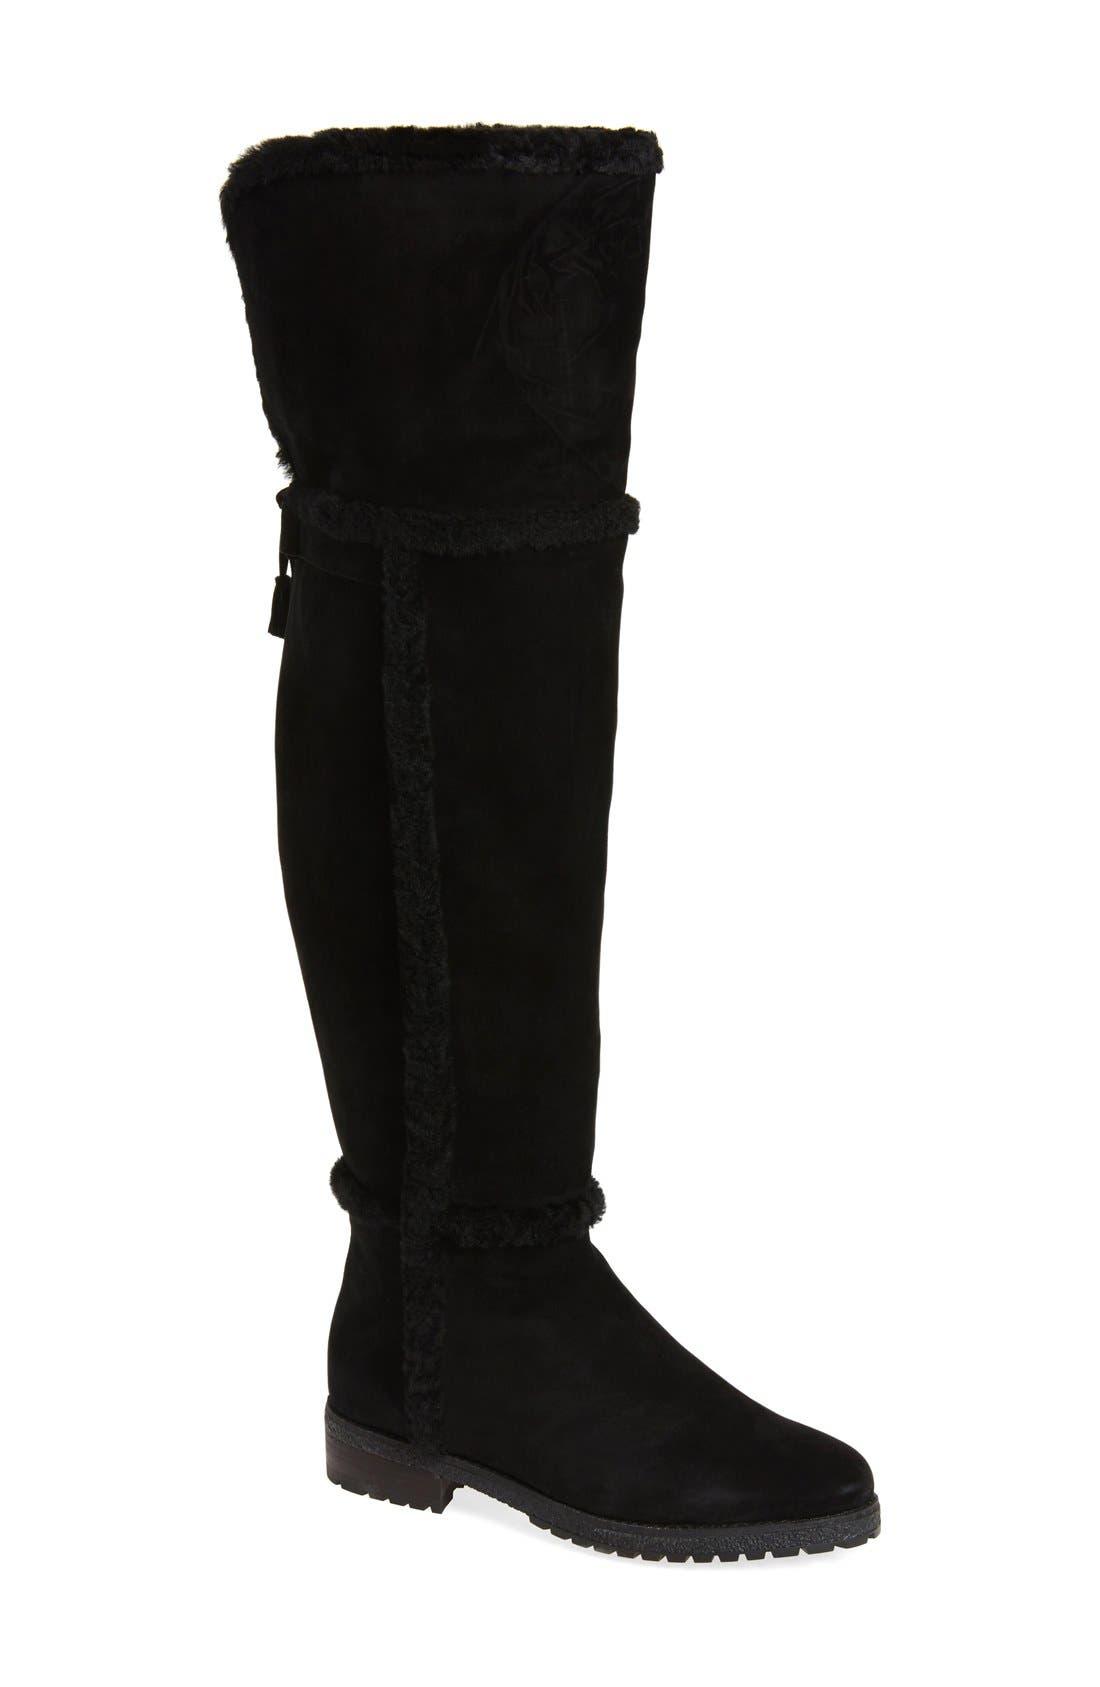 'Tamara' Genuine Shearling Over the Knee Boot,                         Main,                         color,